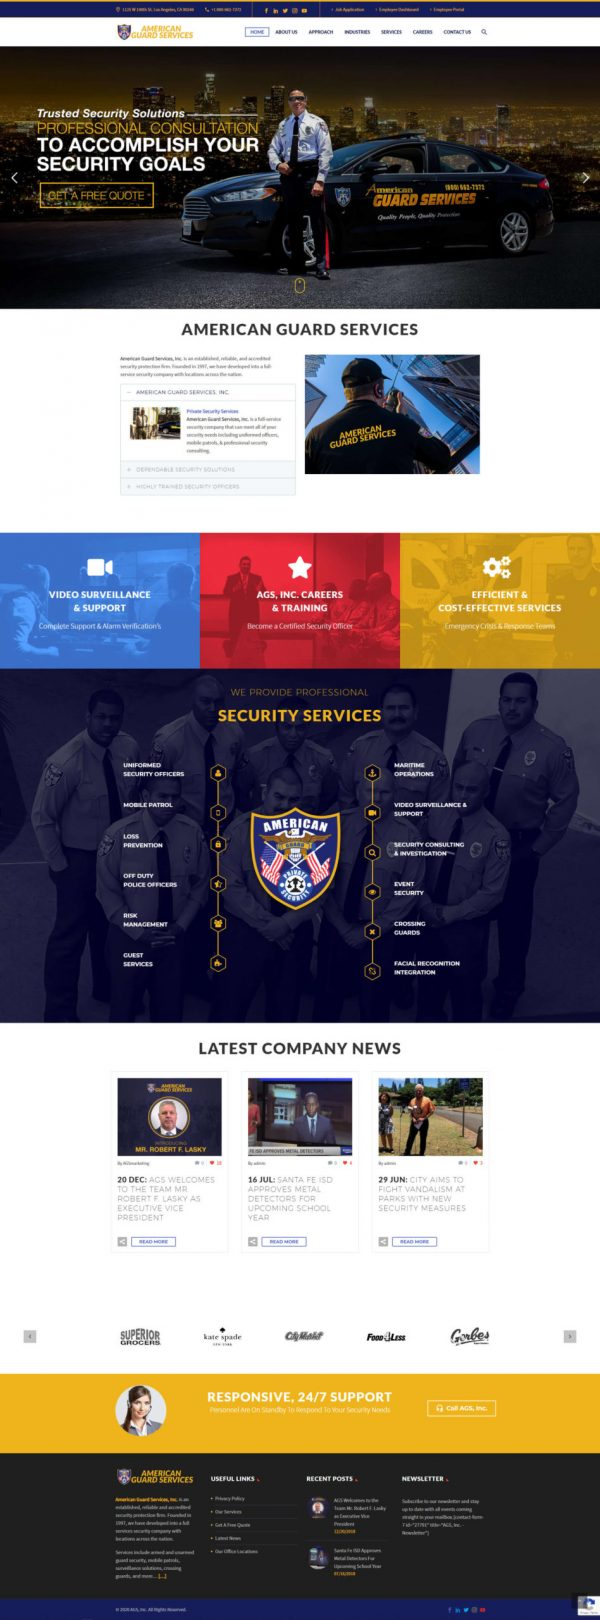 American Guard Services